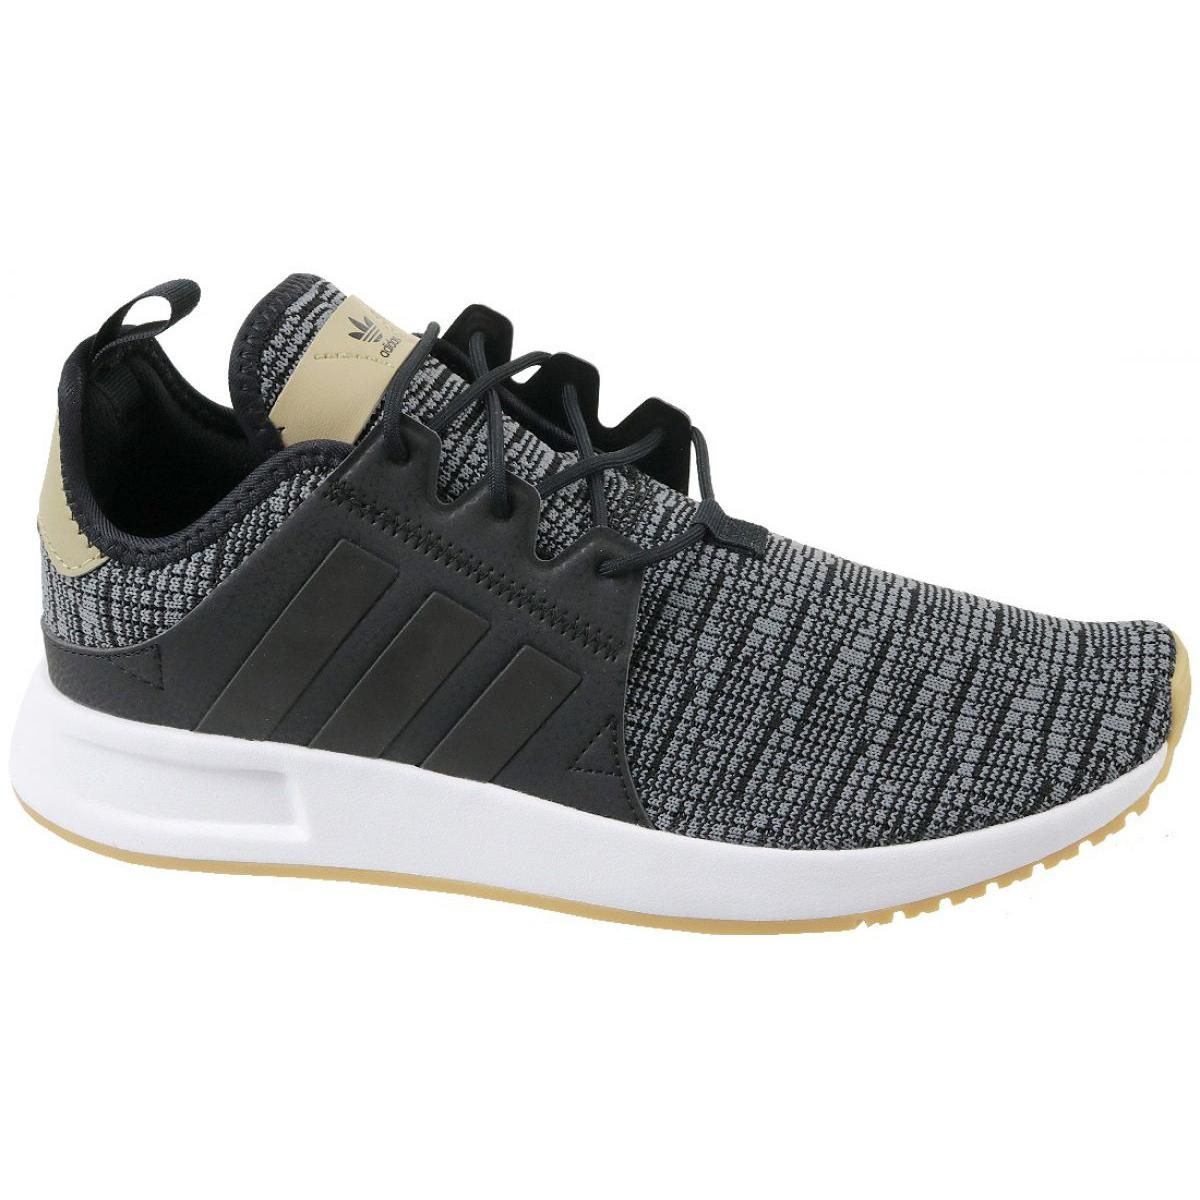 Sport Neu W Adidas Damen Schuh Zx Us 7 Gr37 Sneaker 100 v0w8mNn